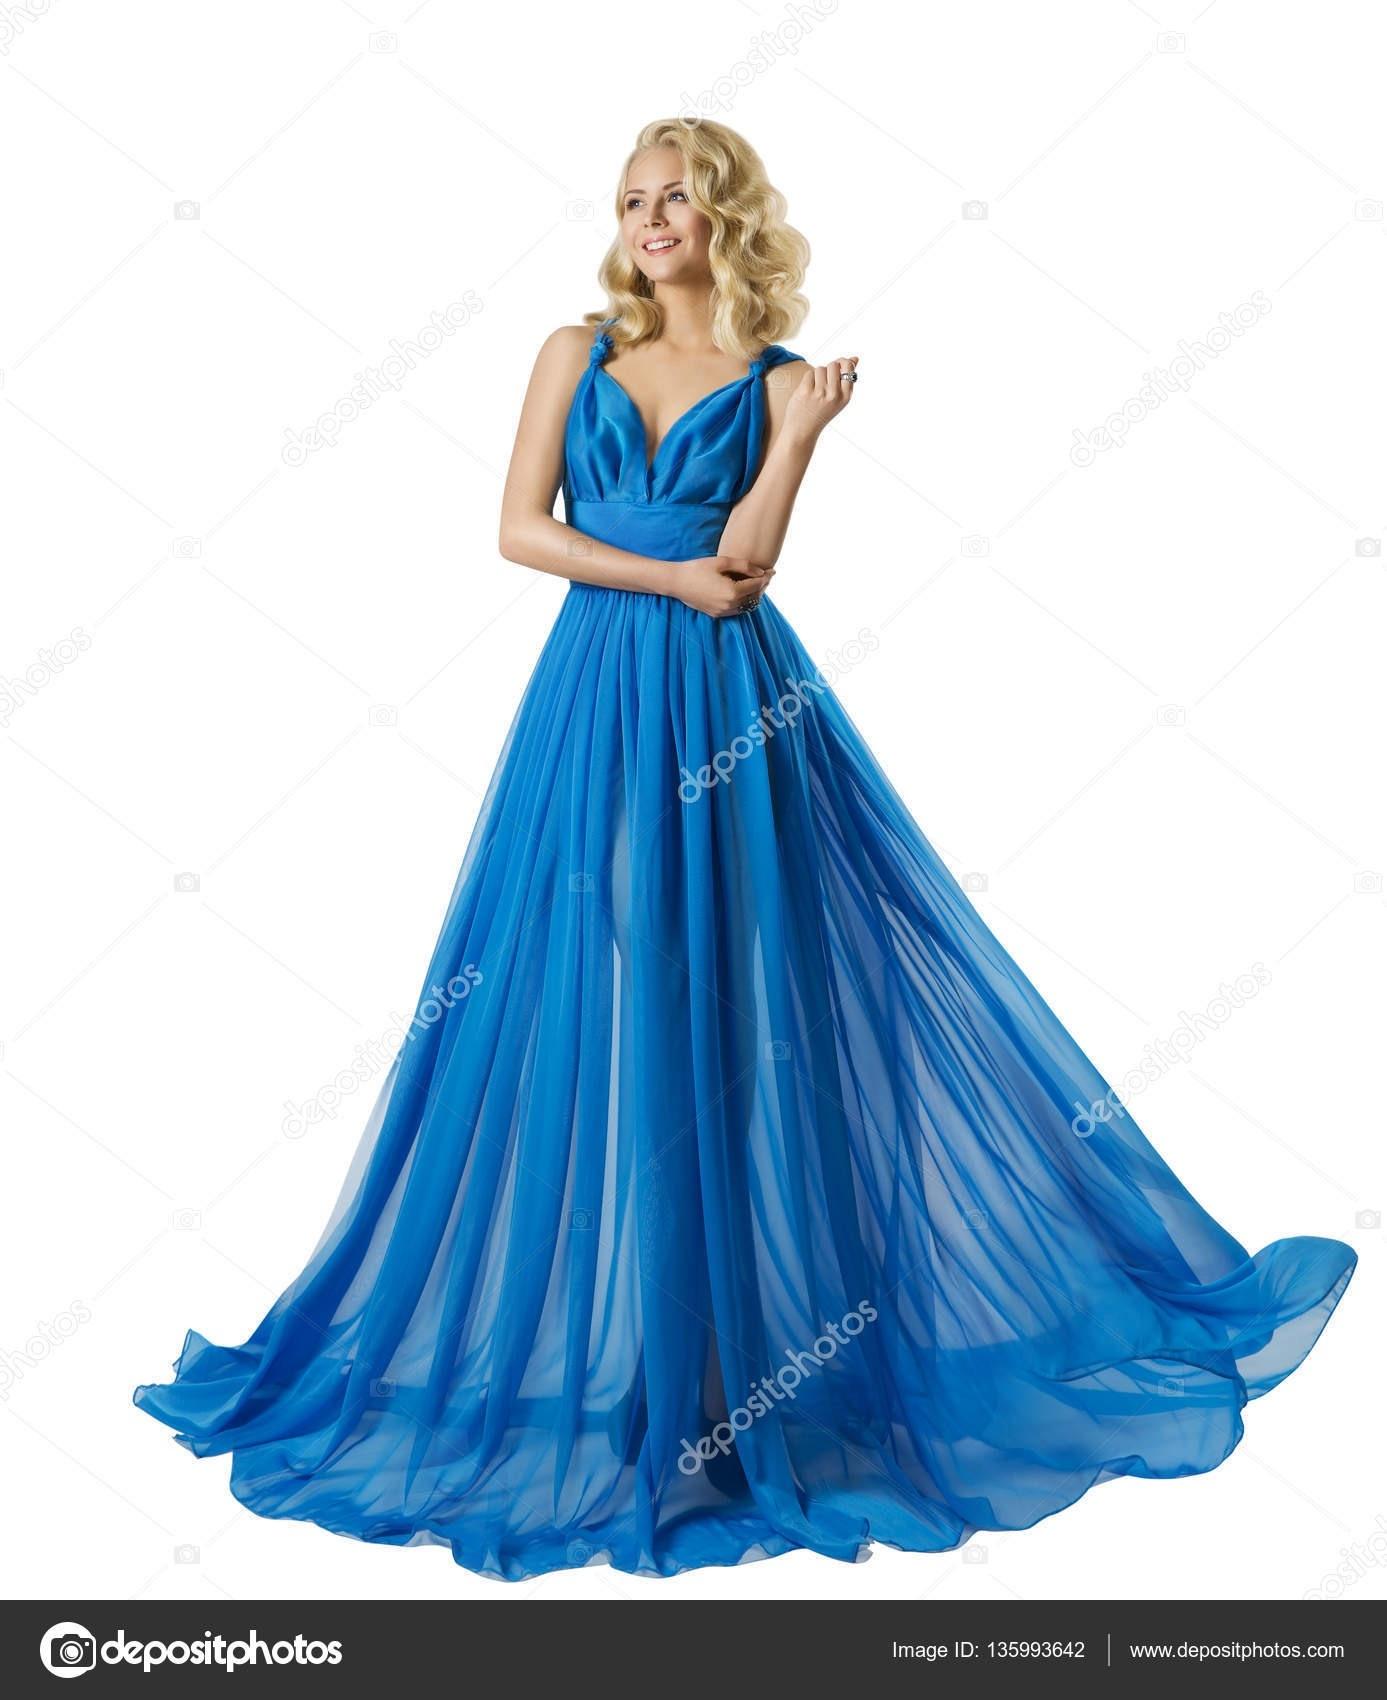 13 Schön Abendkleider Lang Junge Mode BoutiqueFormal Einfach Abendkleider Lang Junge Mode Spezialgebiet